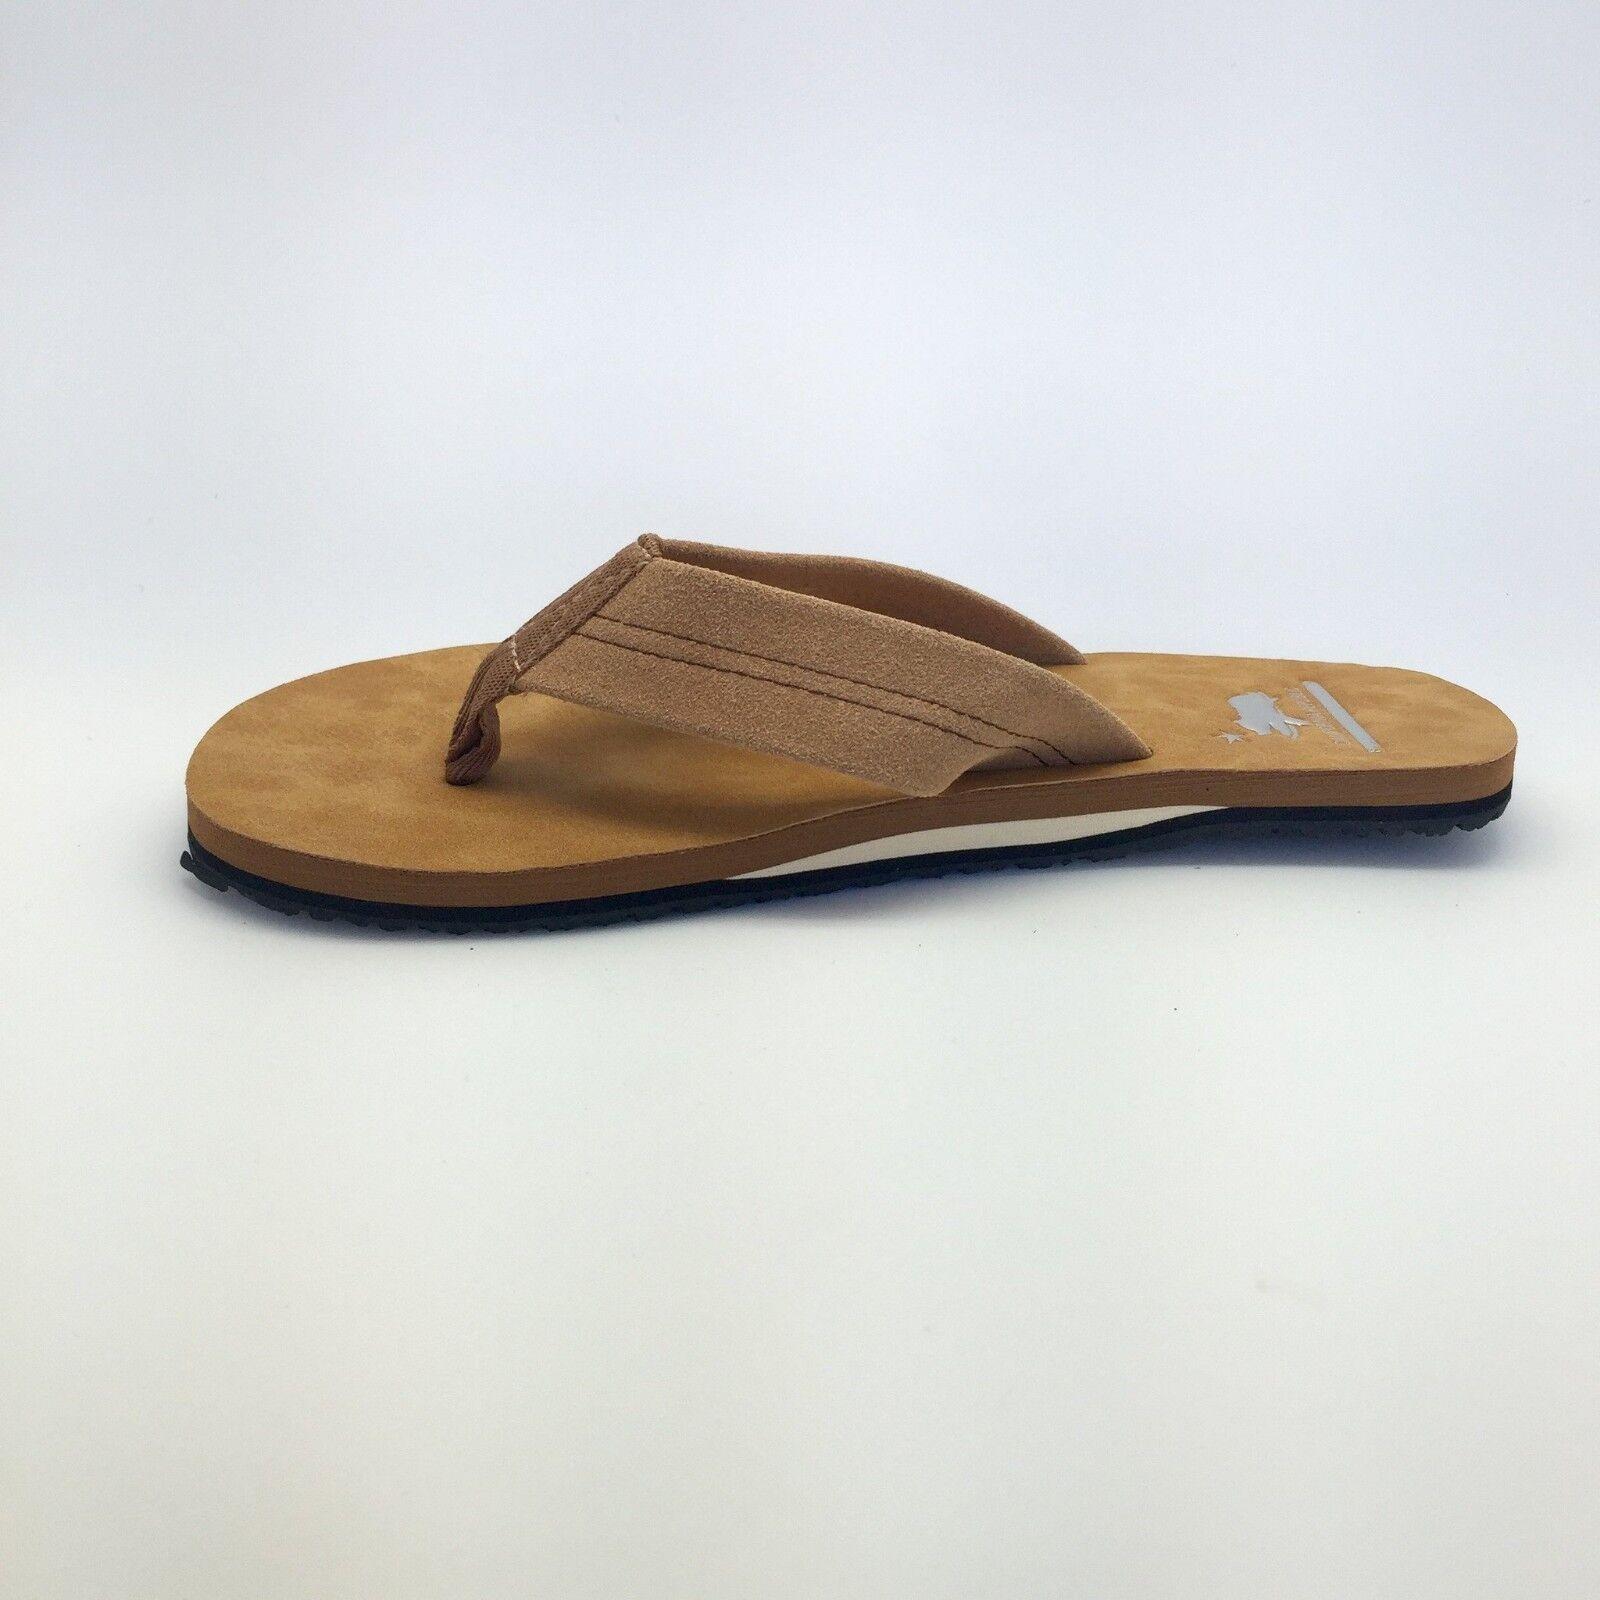 HBCali Napa Womens Non-slip Beach Sandals Tan Beige Size 5 6 7 8 9 10 Flip Flops